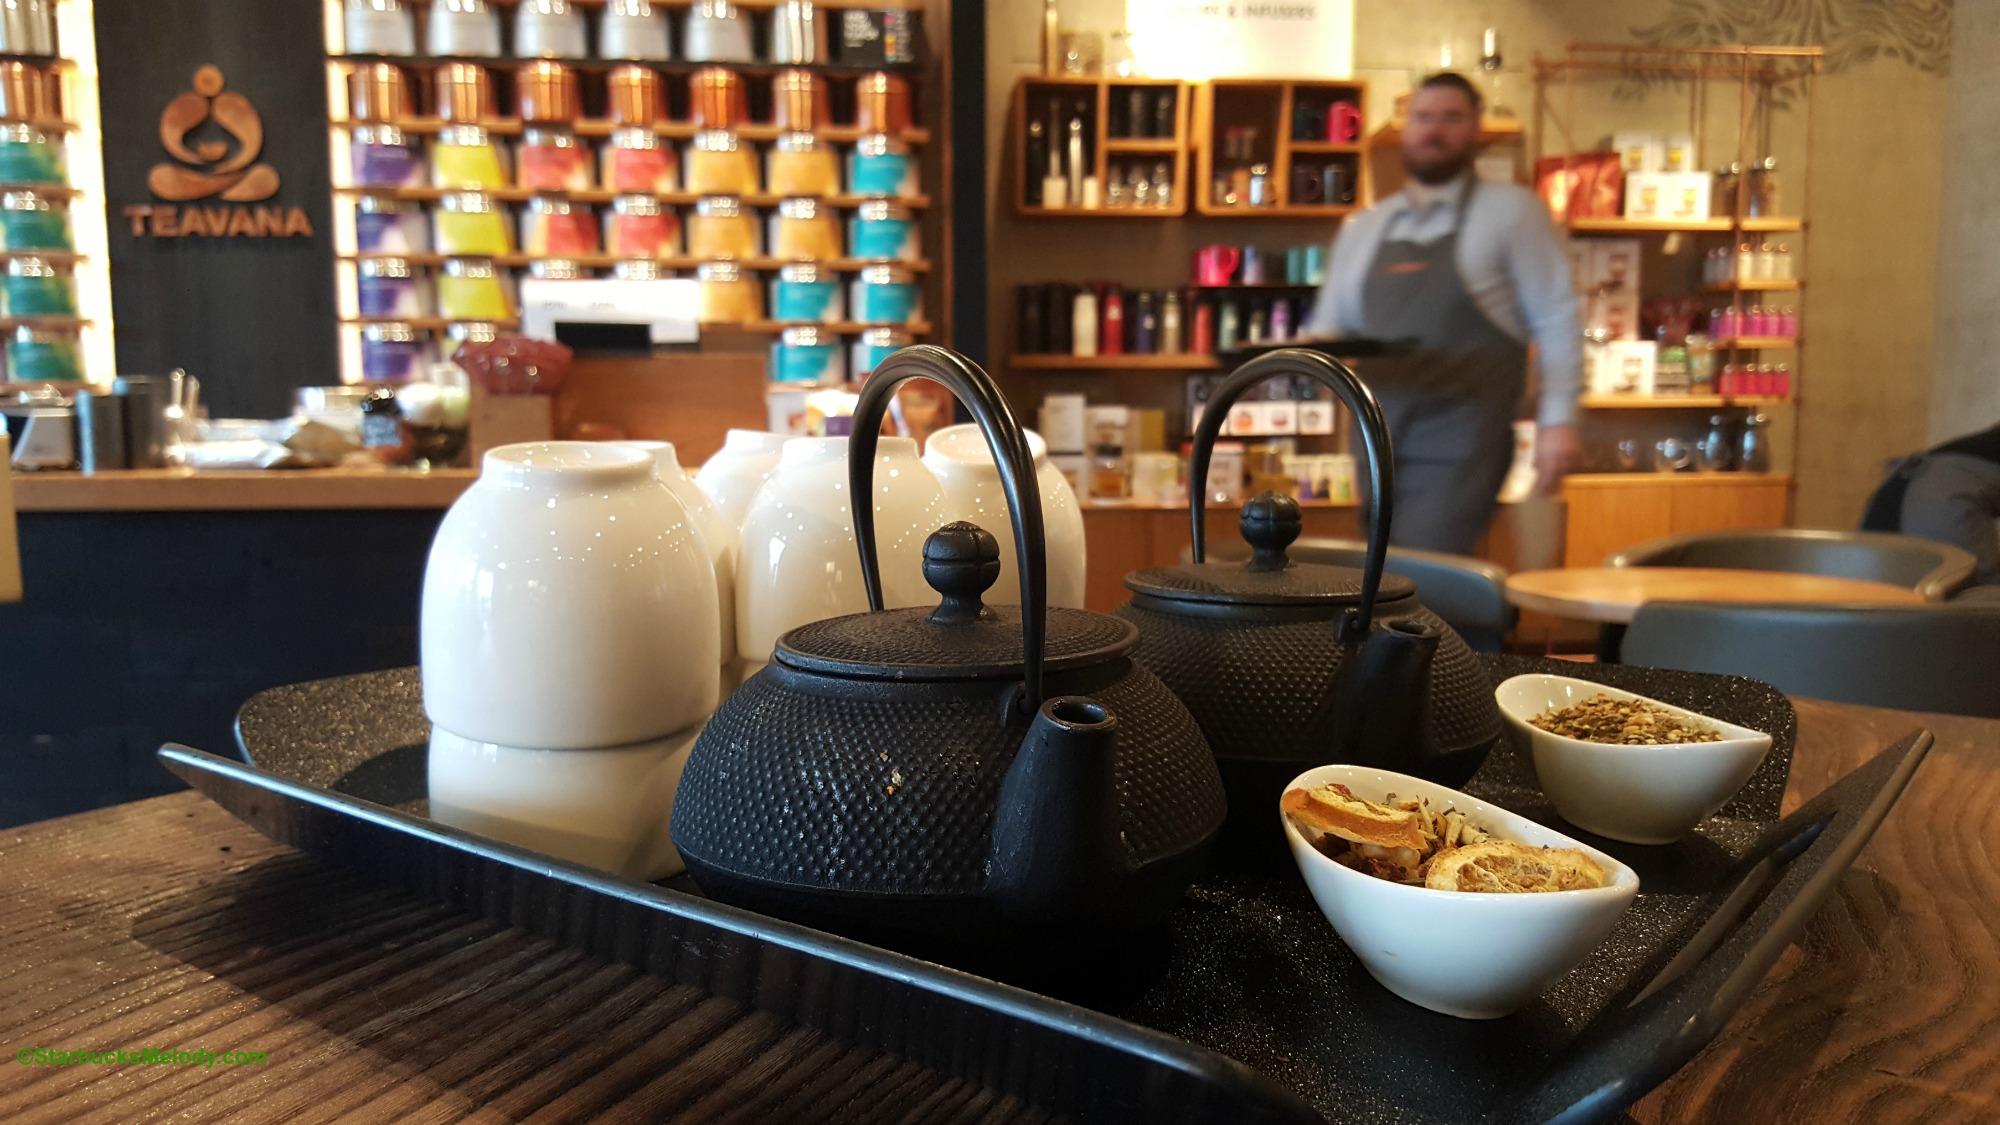 2 - 1 - 20160131_110239 tea tasting just getting started.jpg